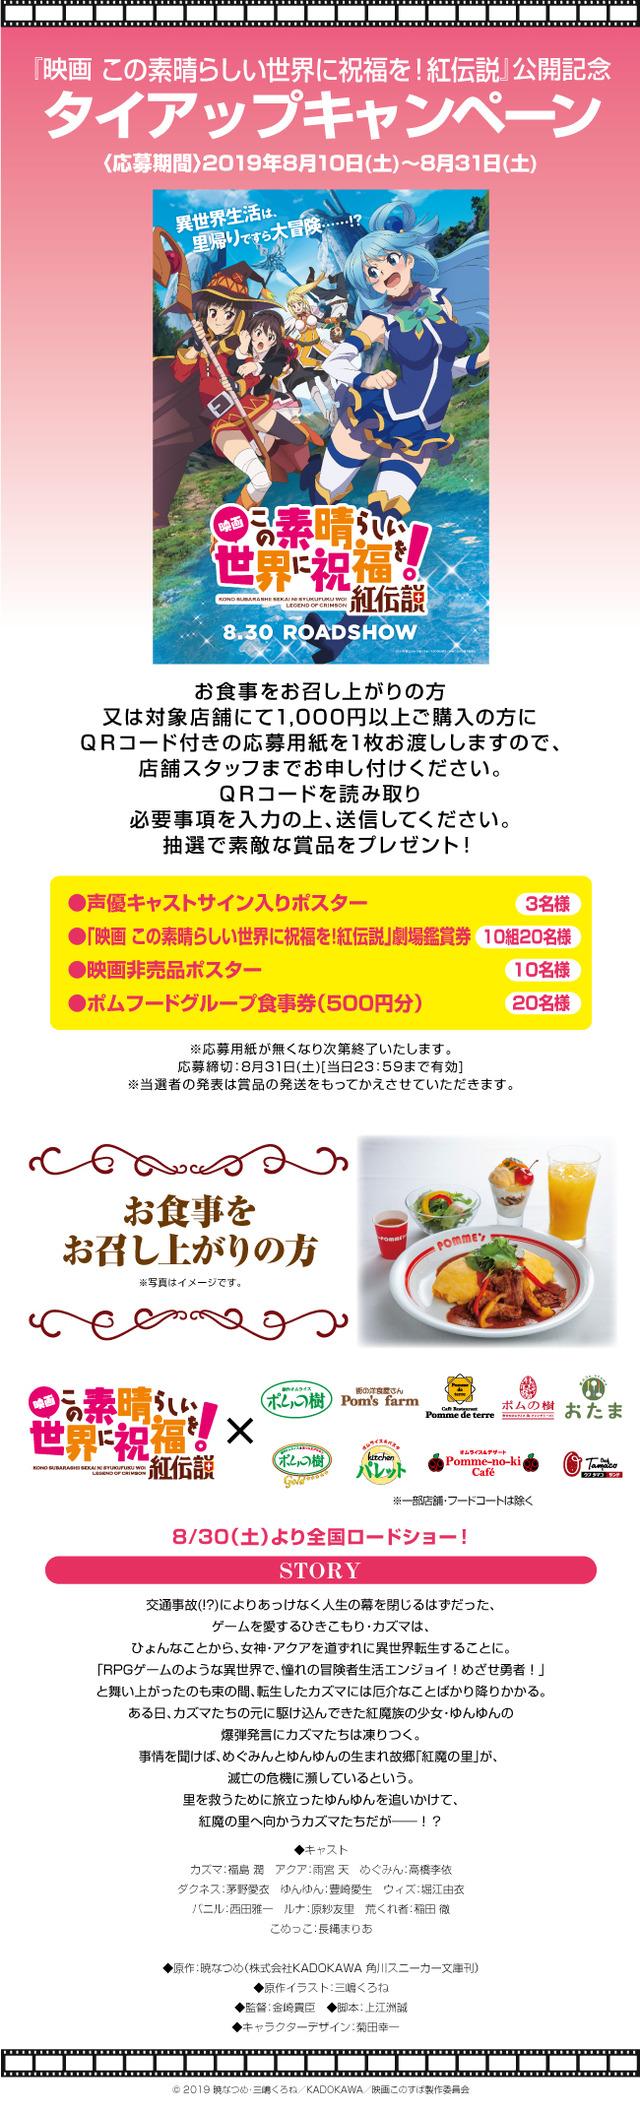 tie-up_20190830konosuba_2